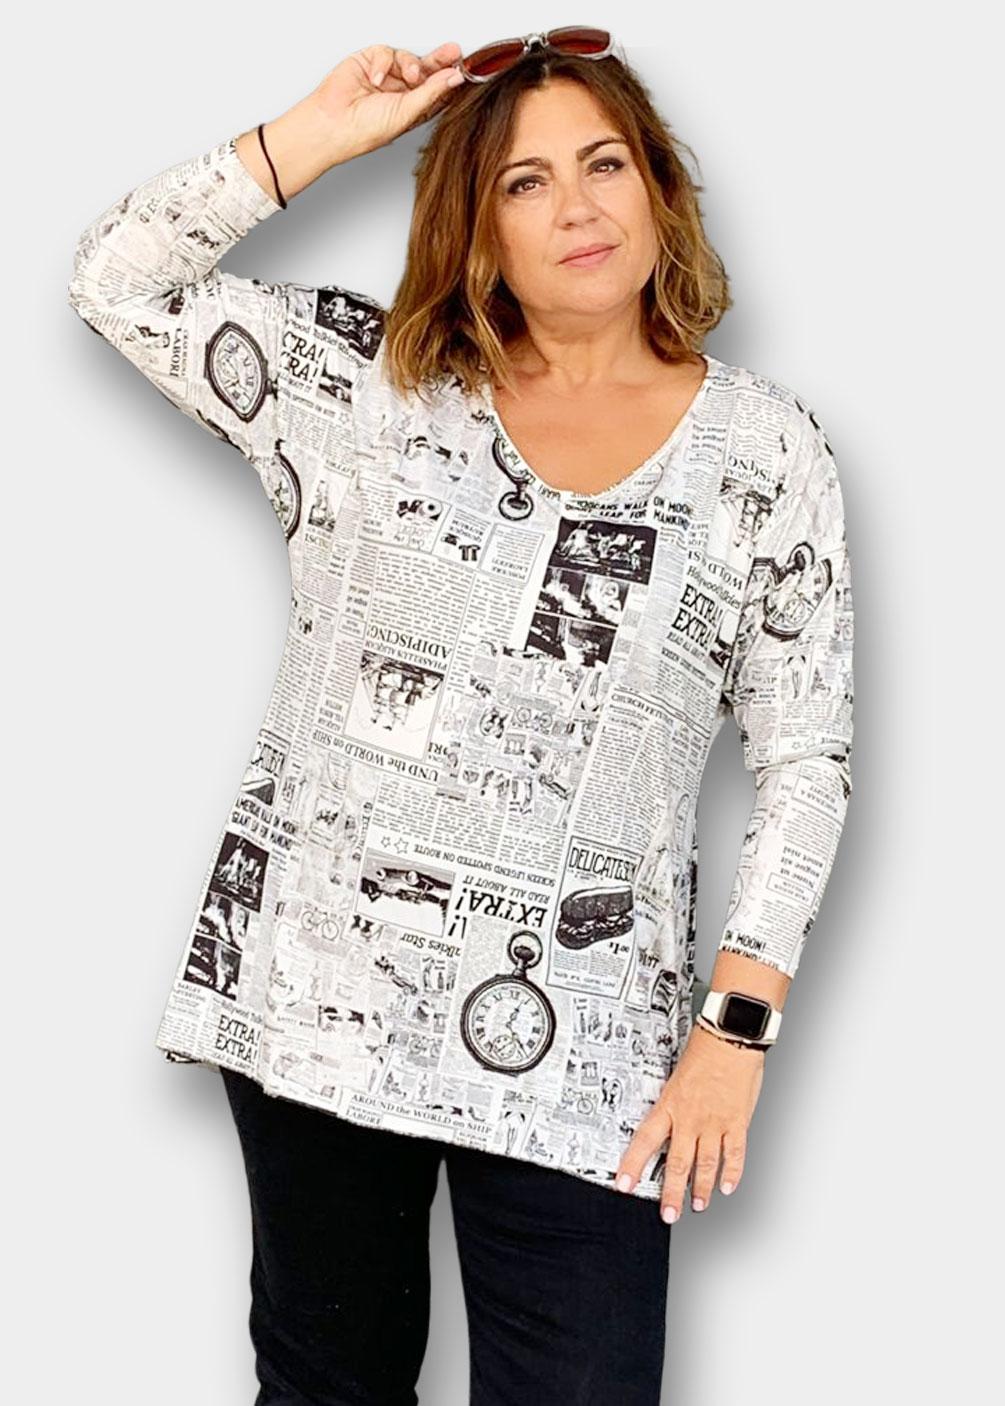 camiseta jersey punto tallas grandes indra auzu 2021 2022 otoño curvy plus size